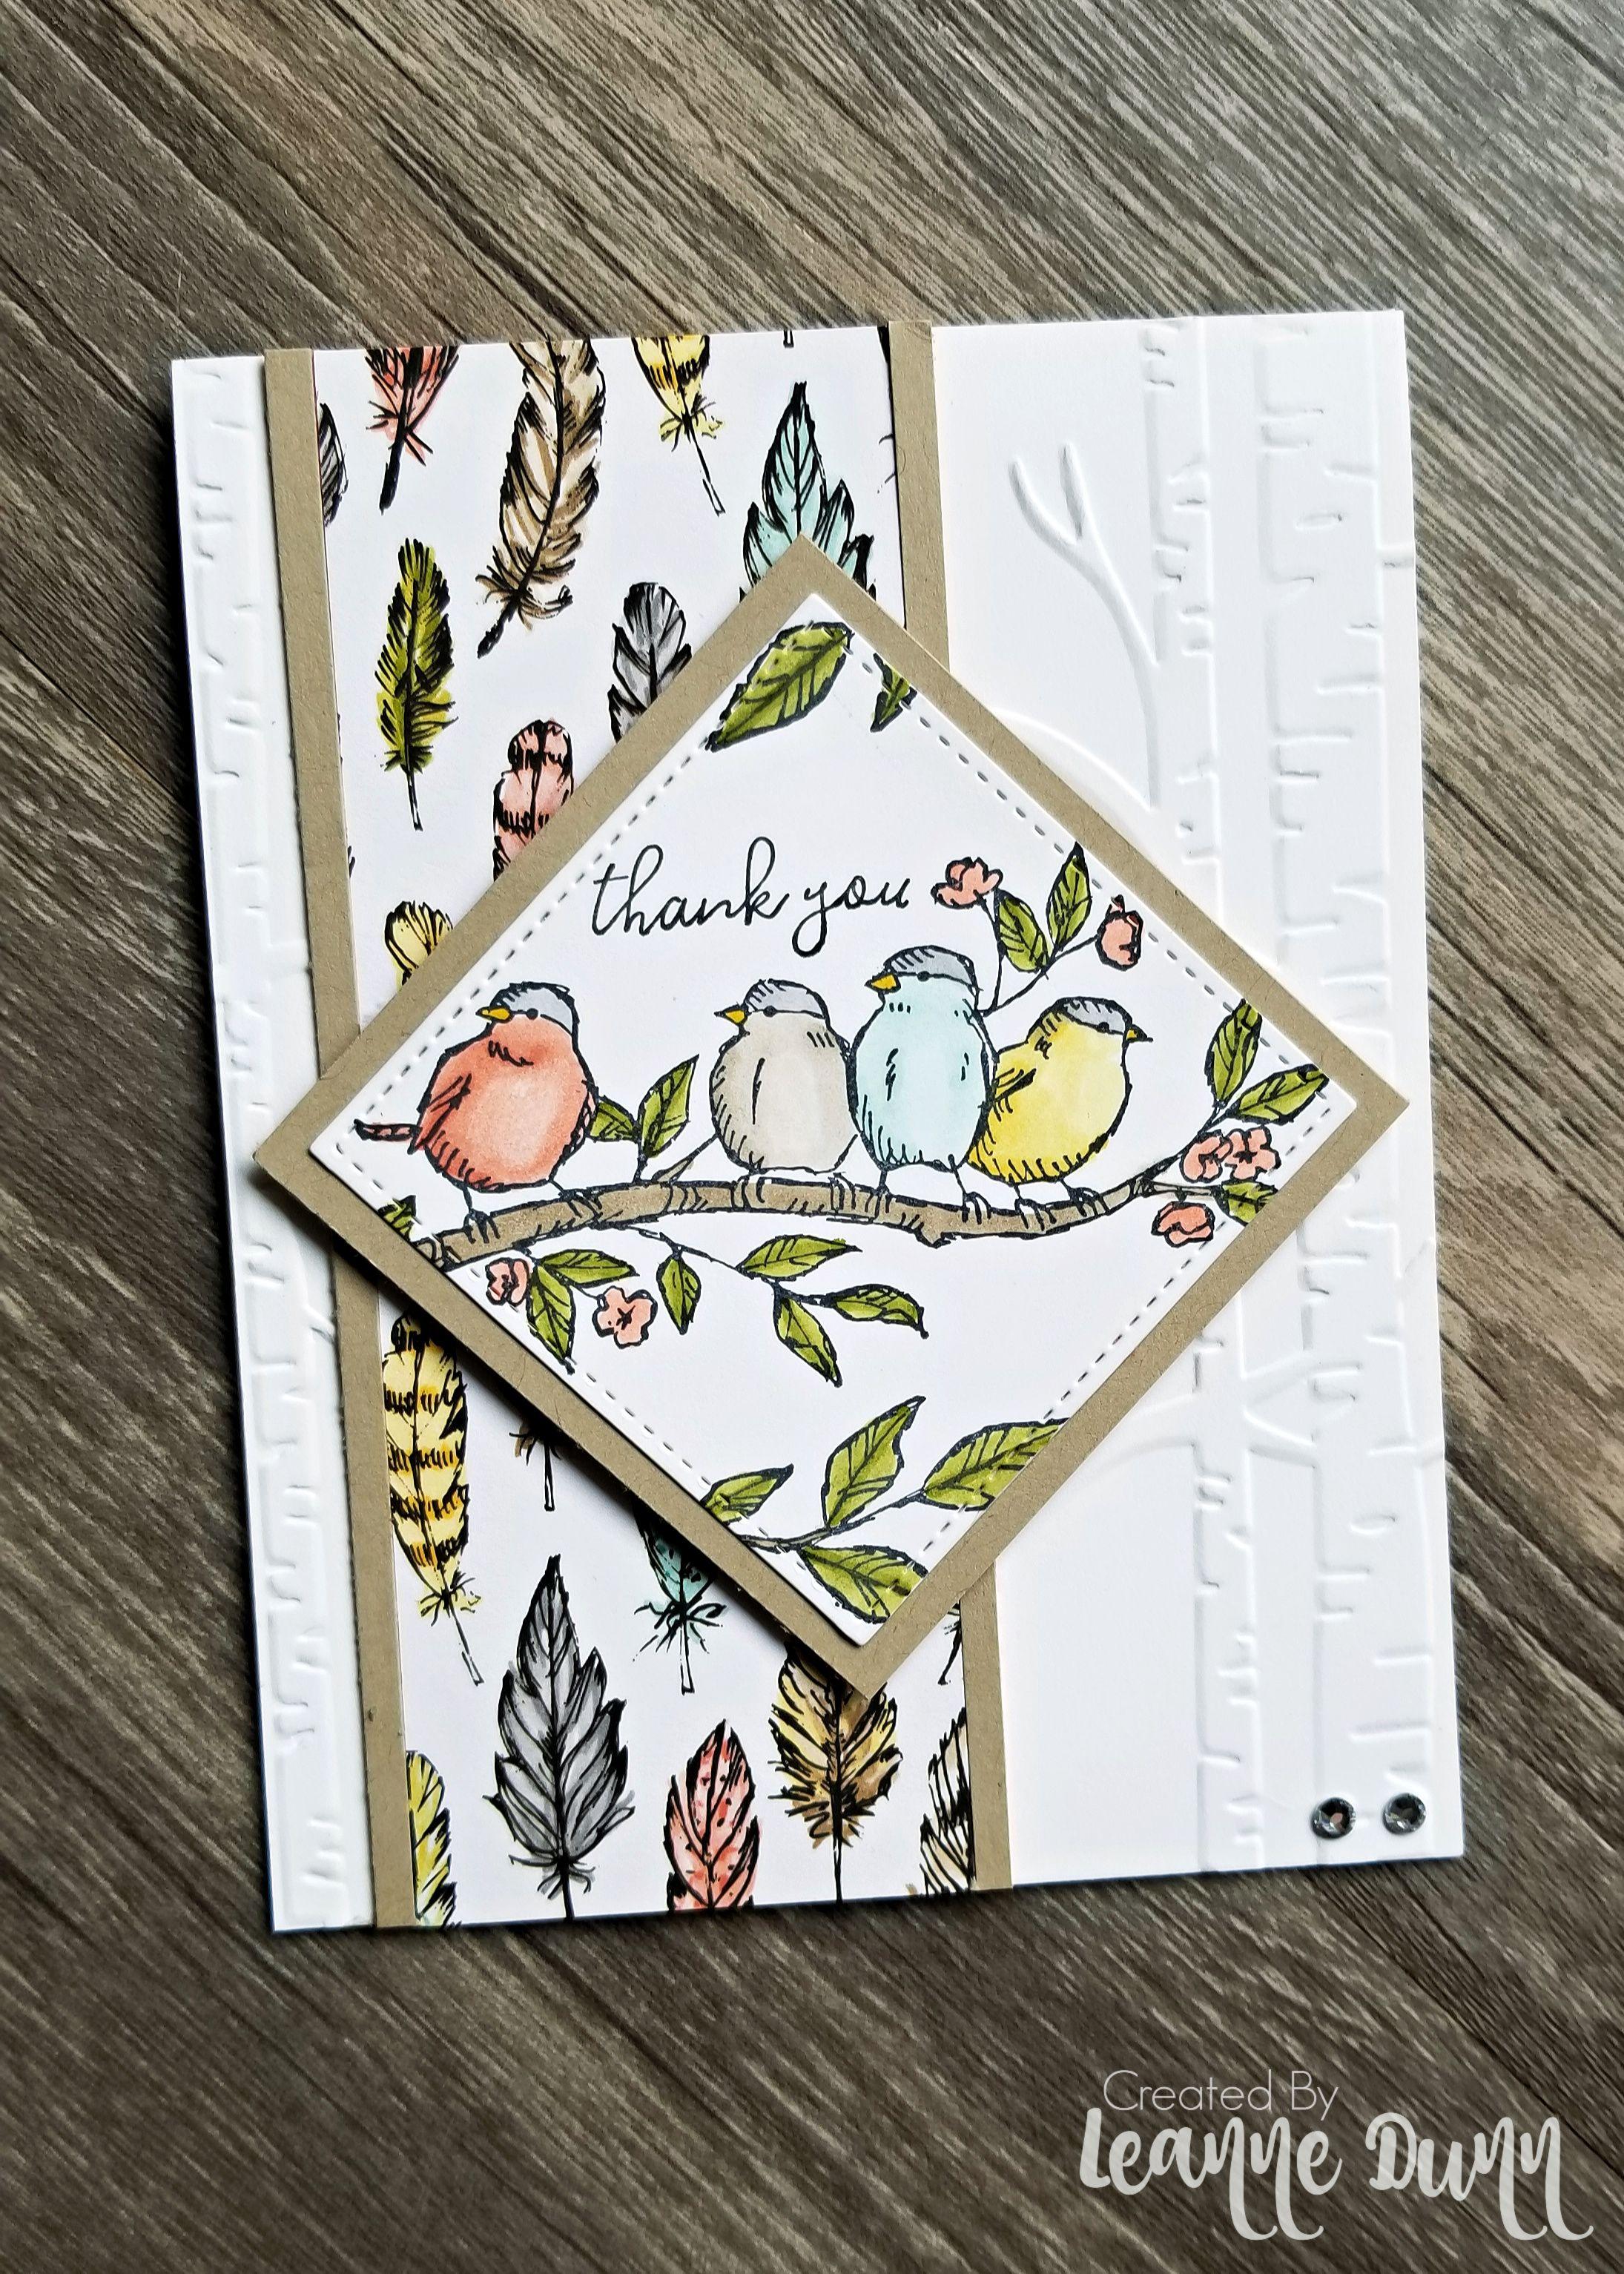 Free As A Bird Stampin' Up! Card